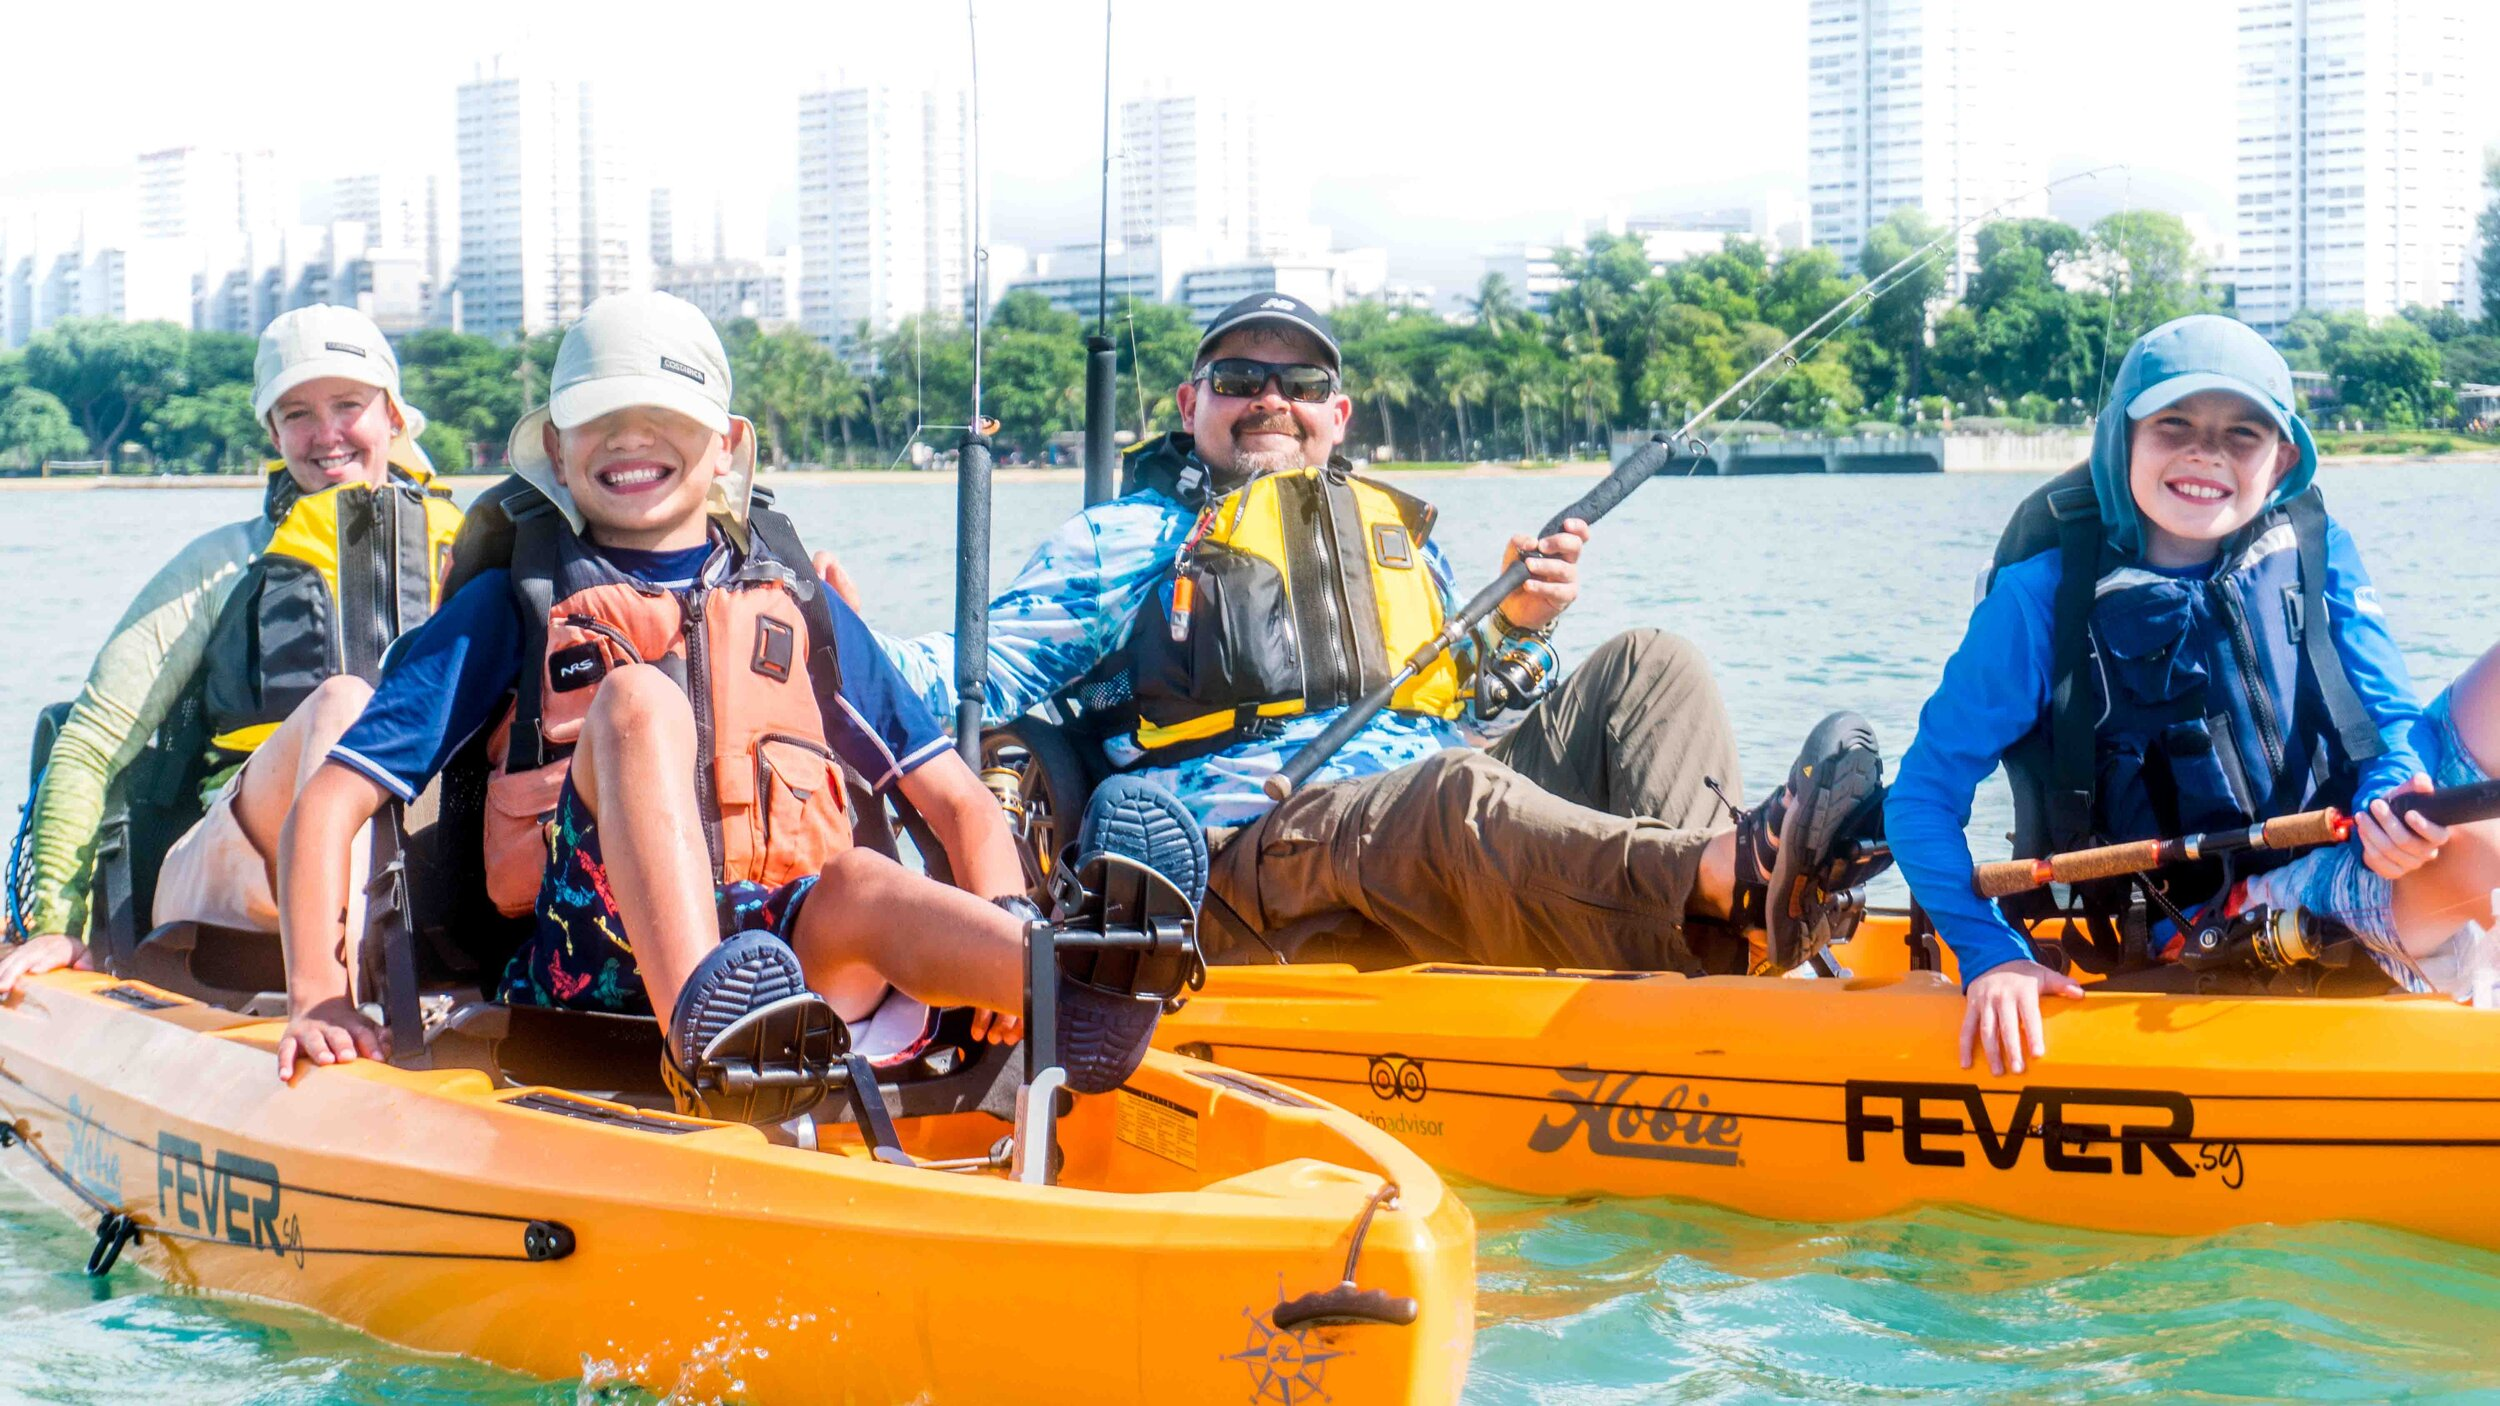 group of kayakers posing on kayaks